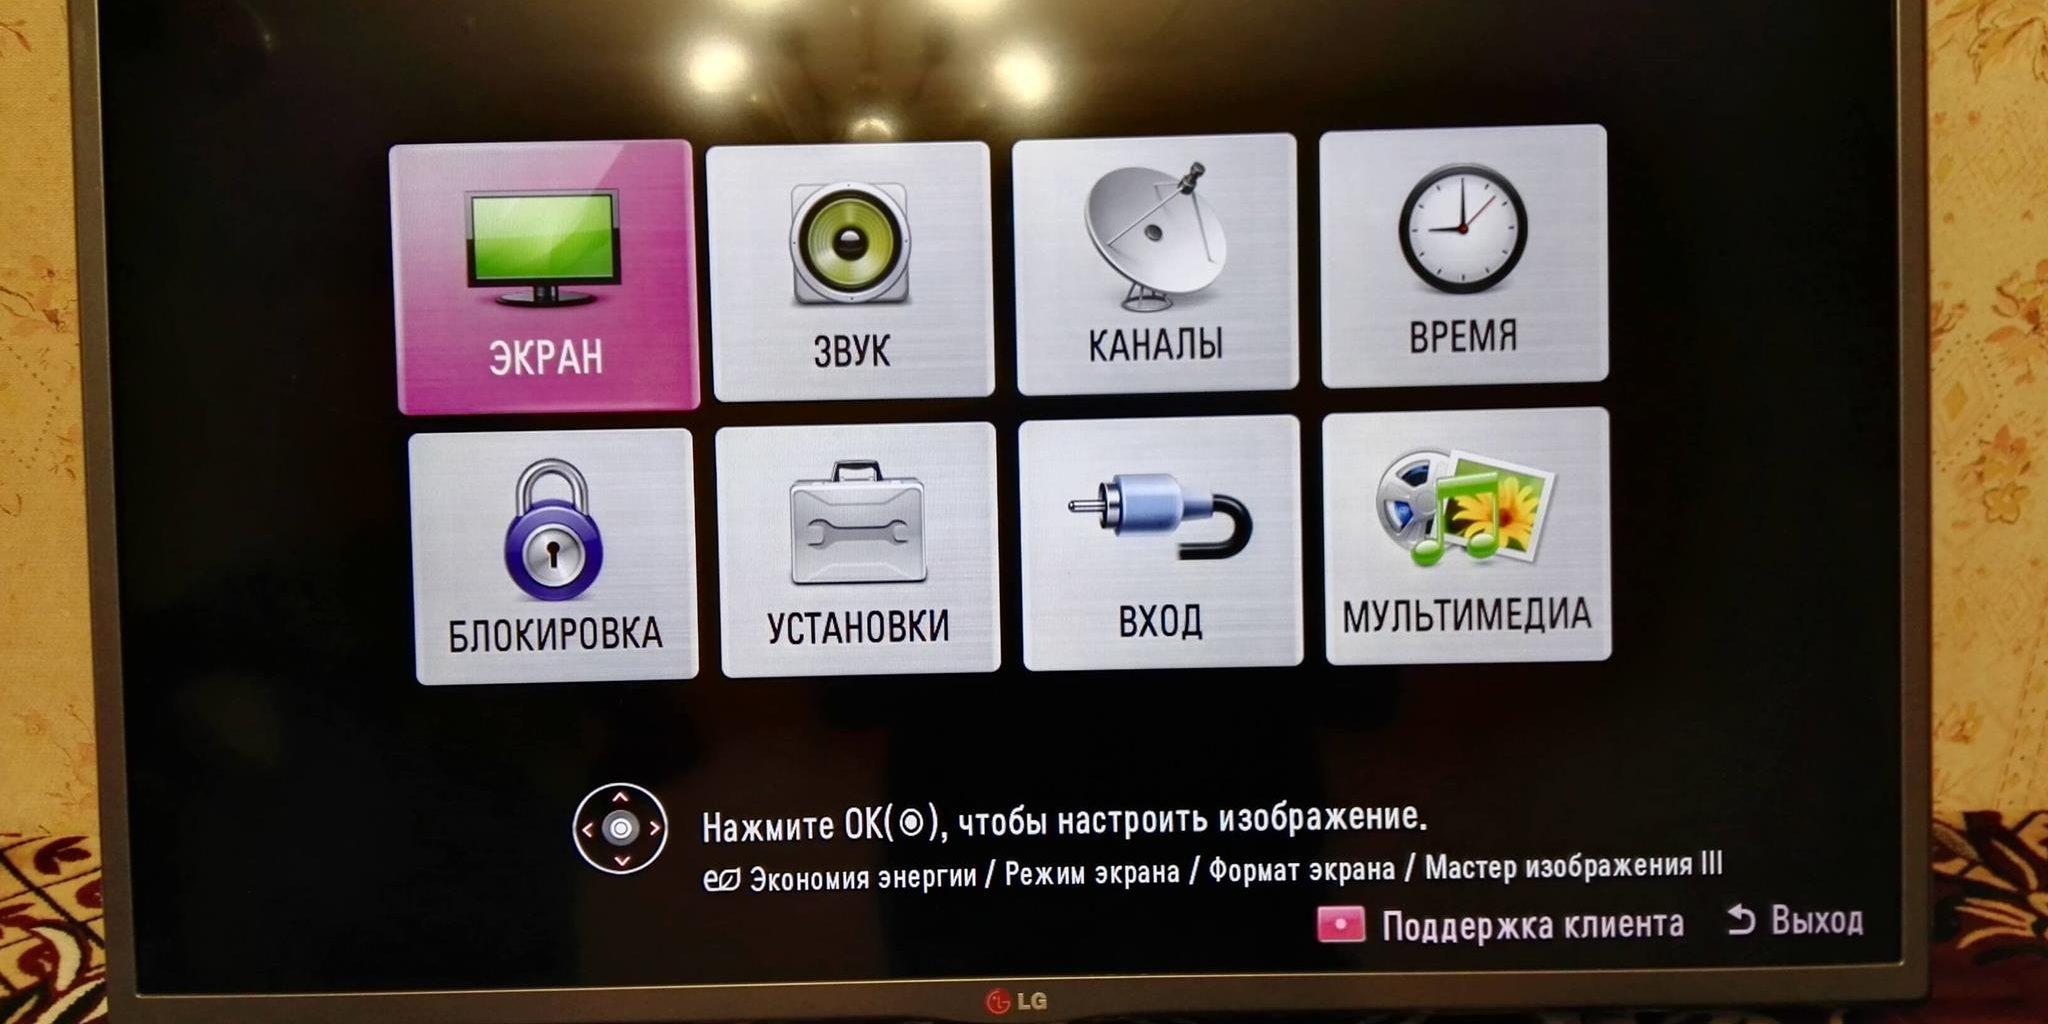 Ремонт подсветки в телевизоре LG 32LB582V. Доработка блока питания EAX65391401 LGP32-14PL1. Инструкция по ограничению тока.